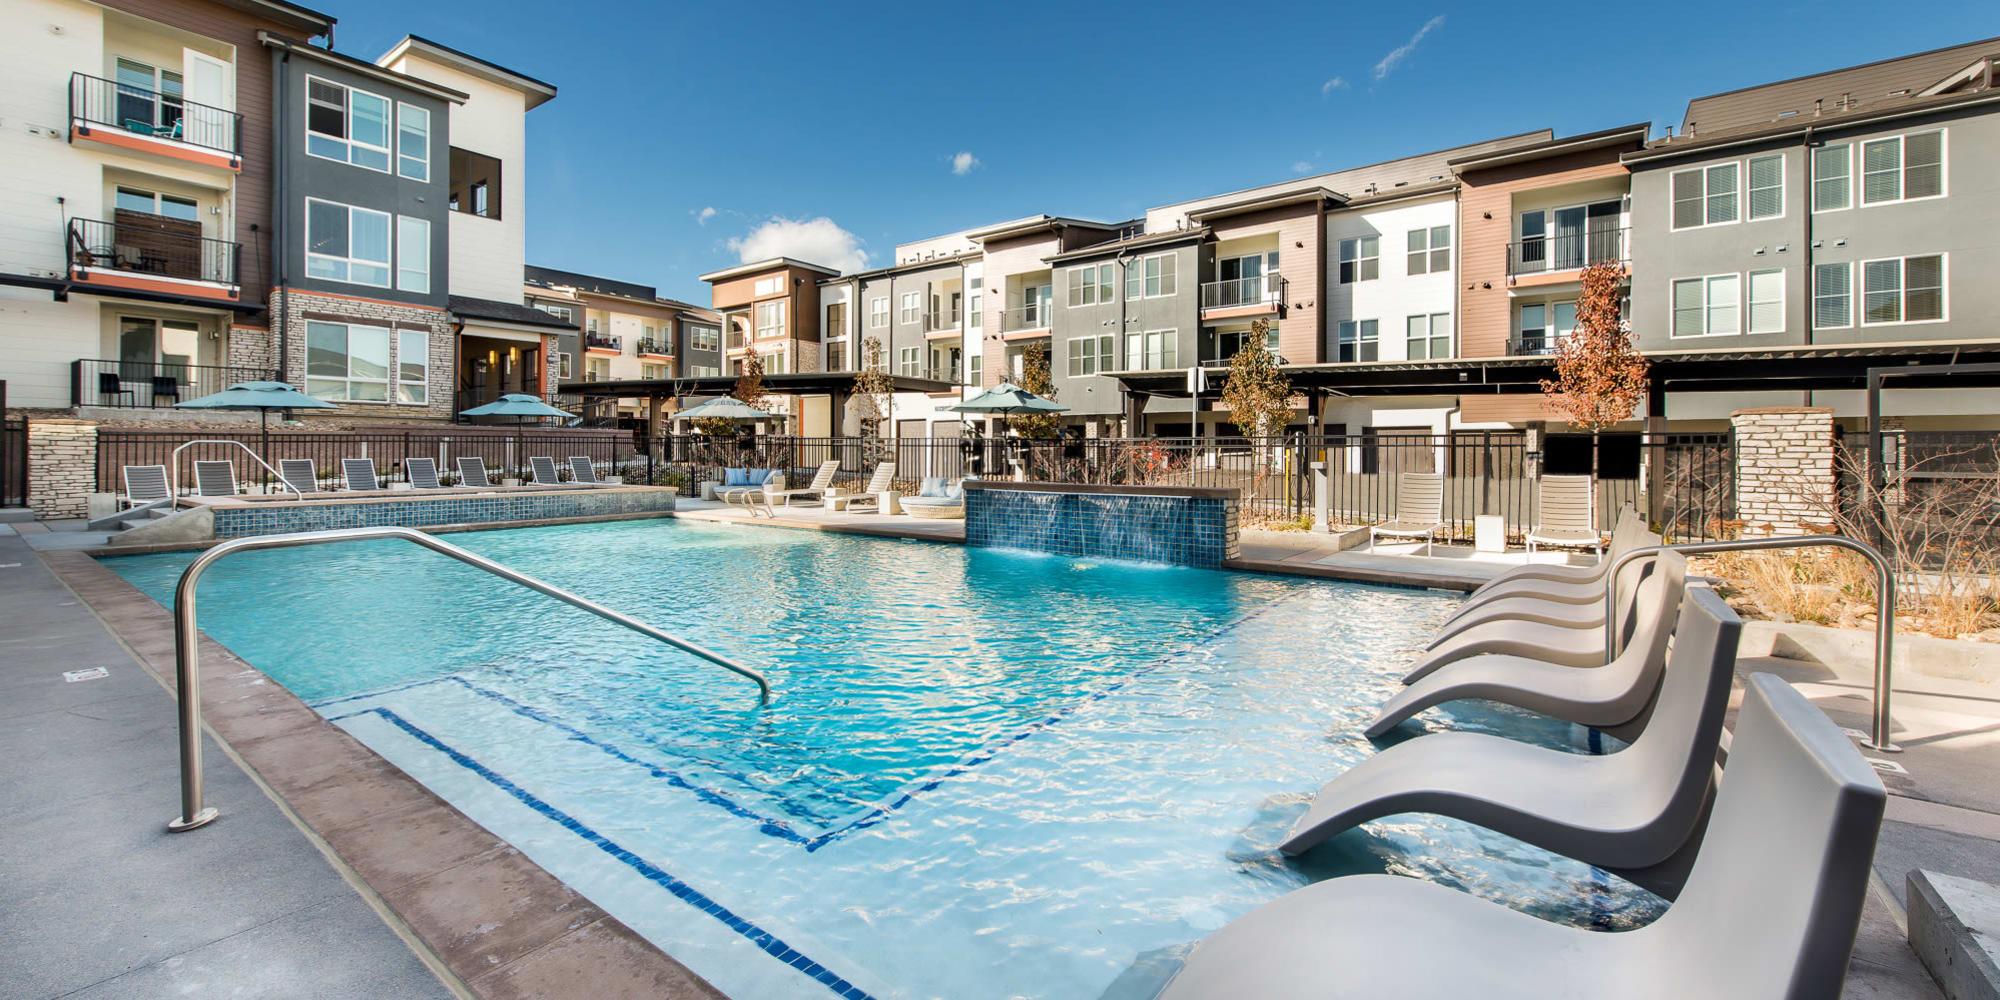 Elevate apartments in Englewood, Colorado